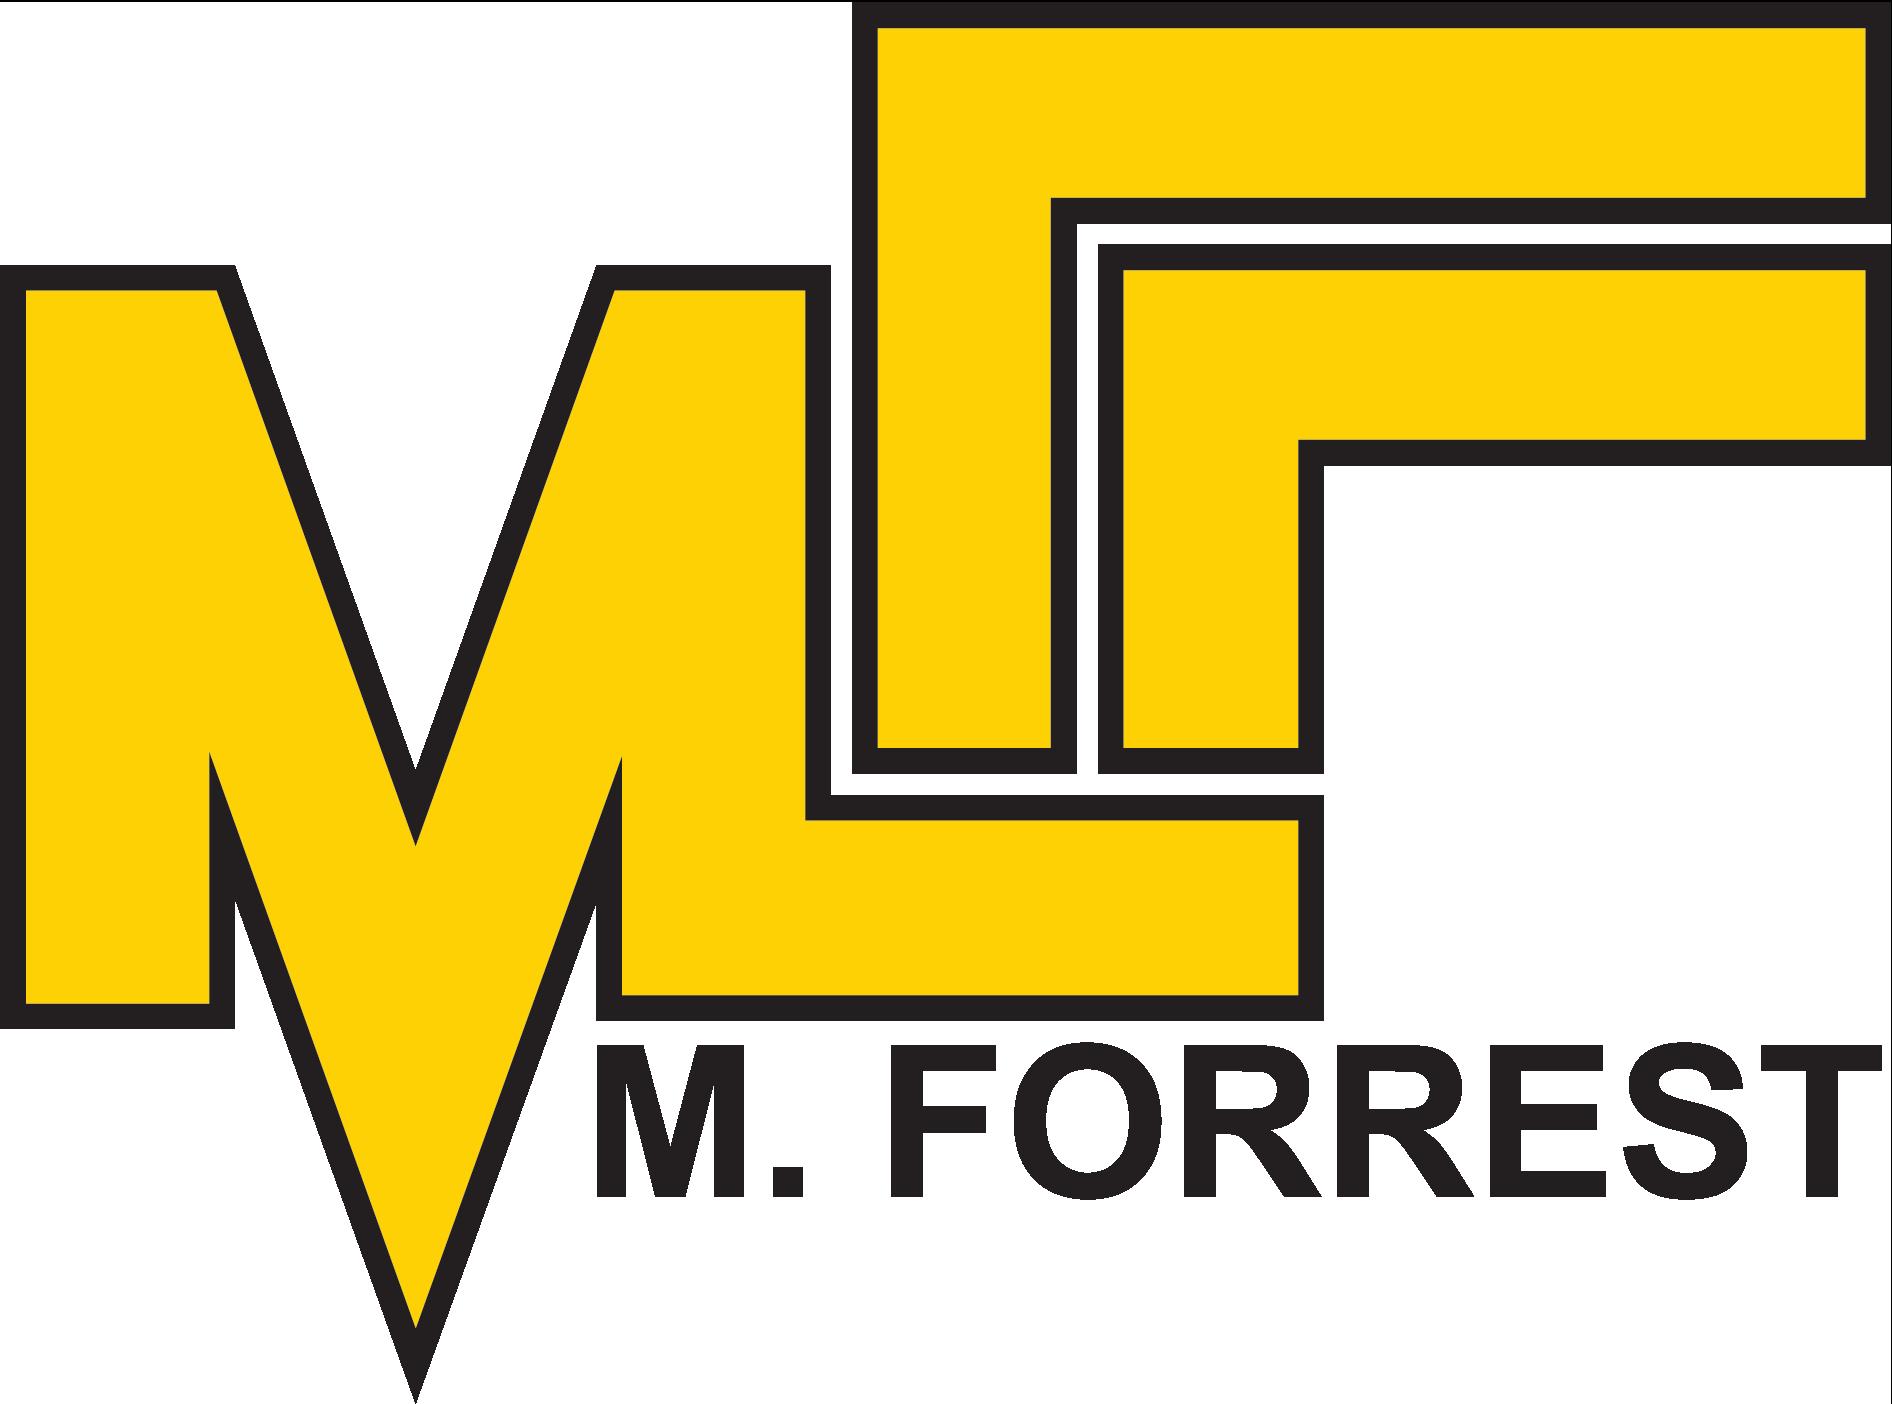 Entreprise Générale Malta Forrest (EGMF)   Forrest Group